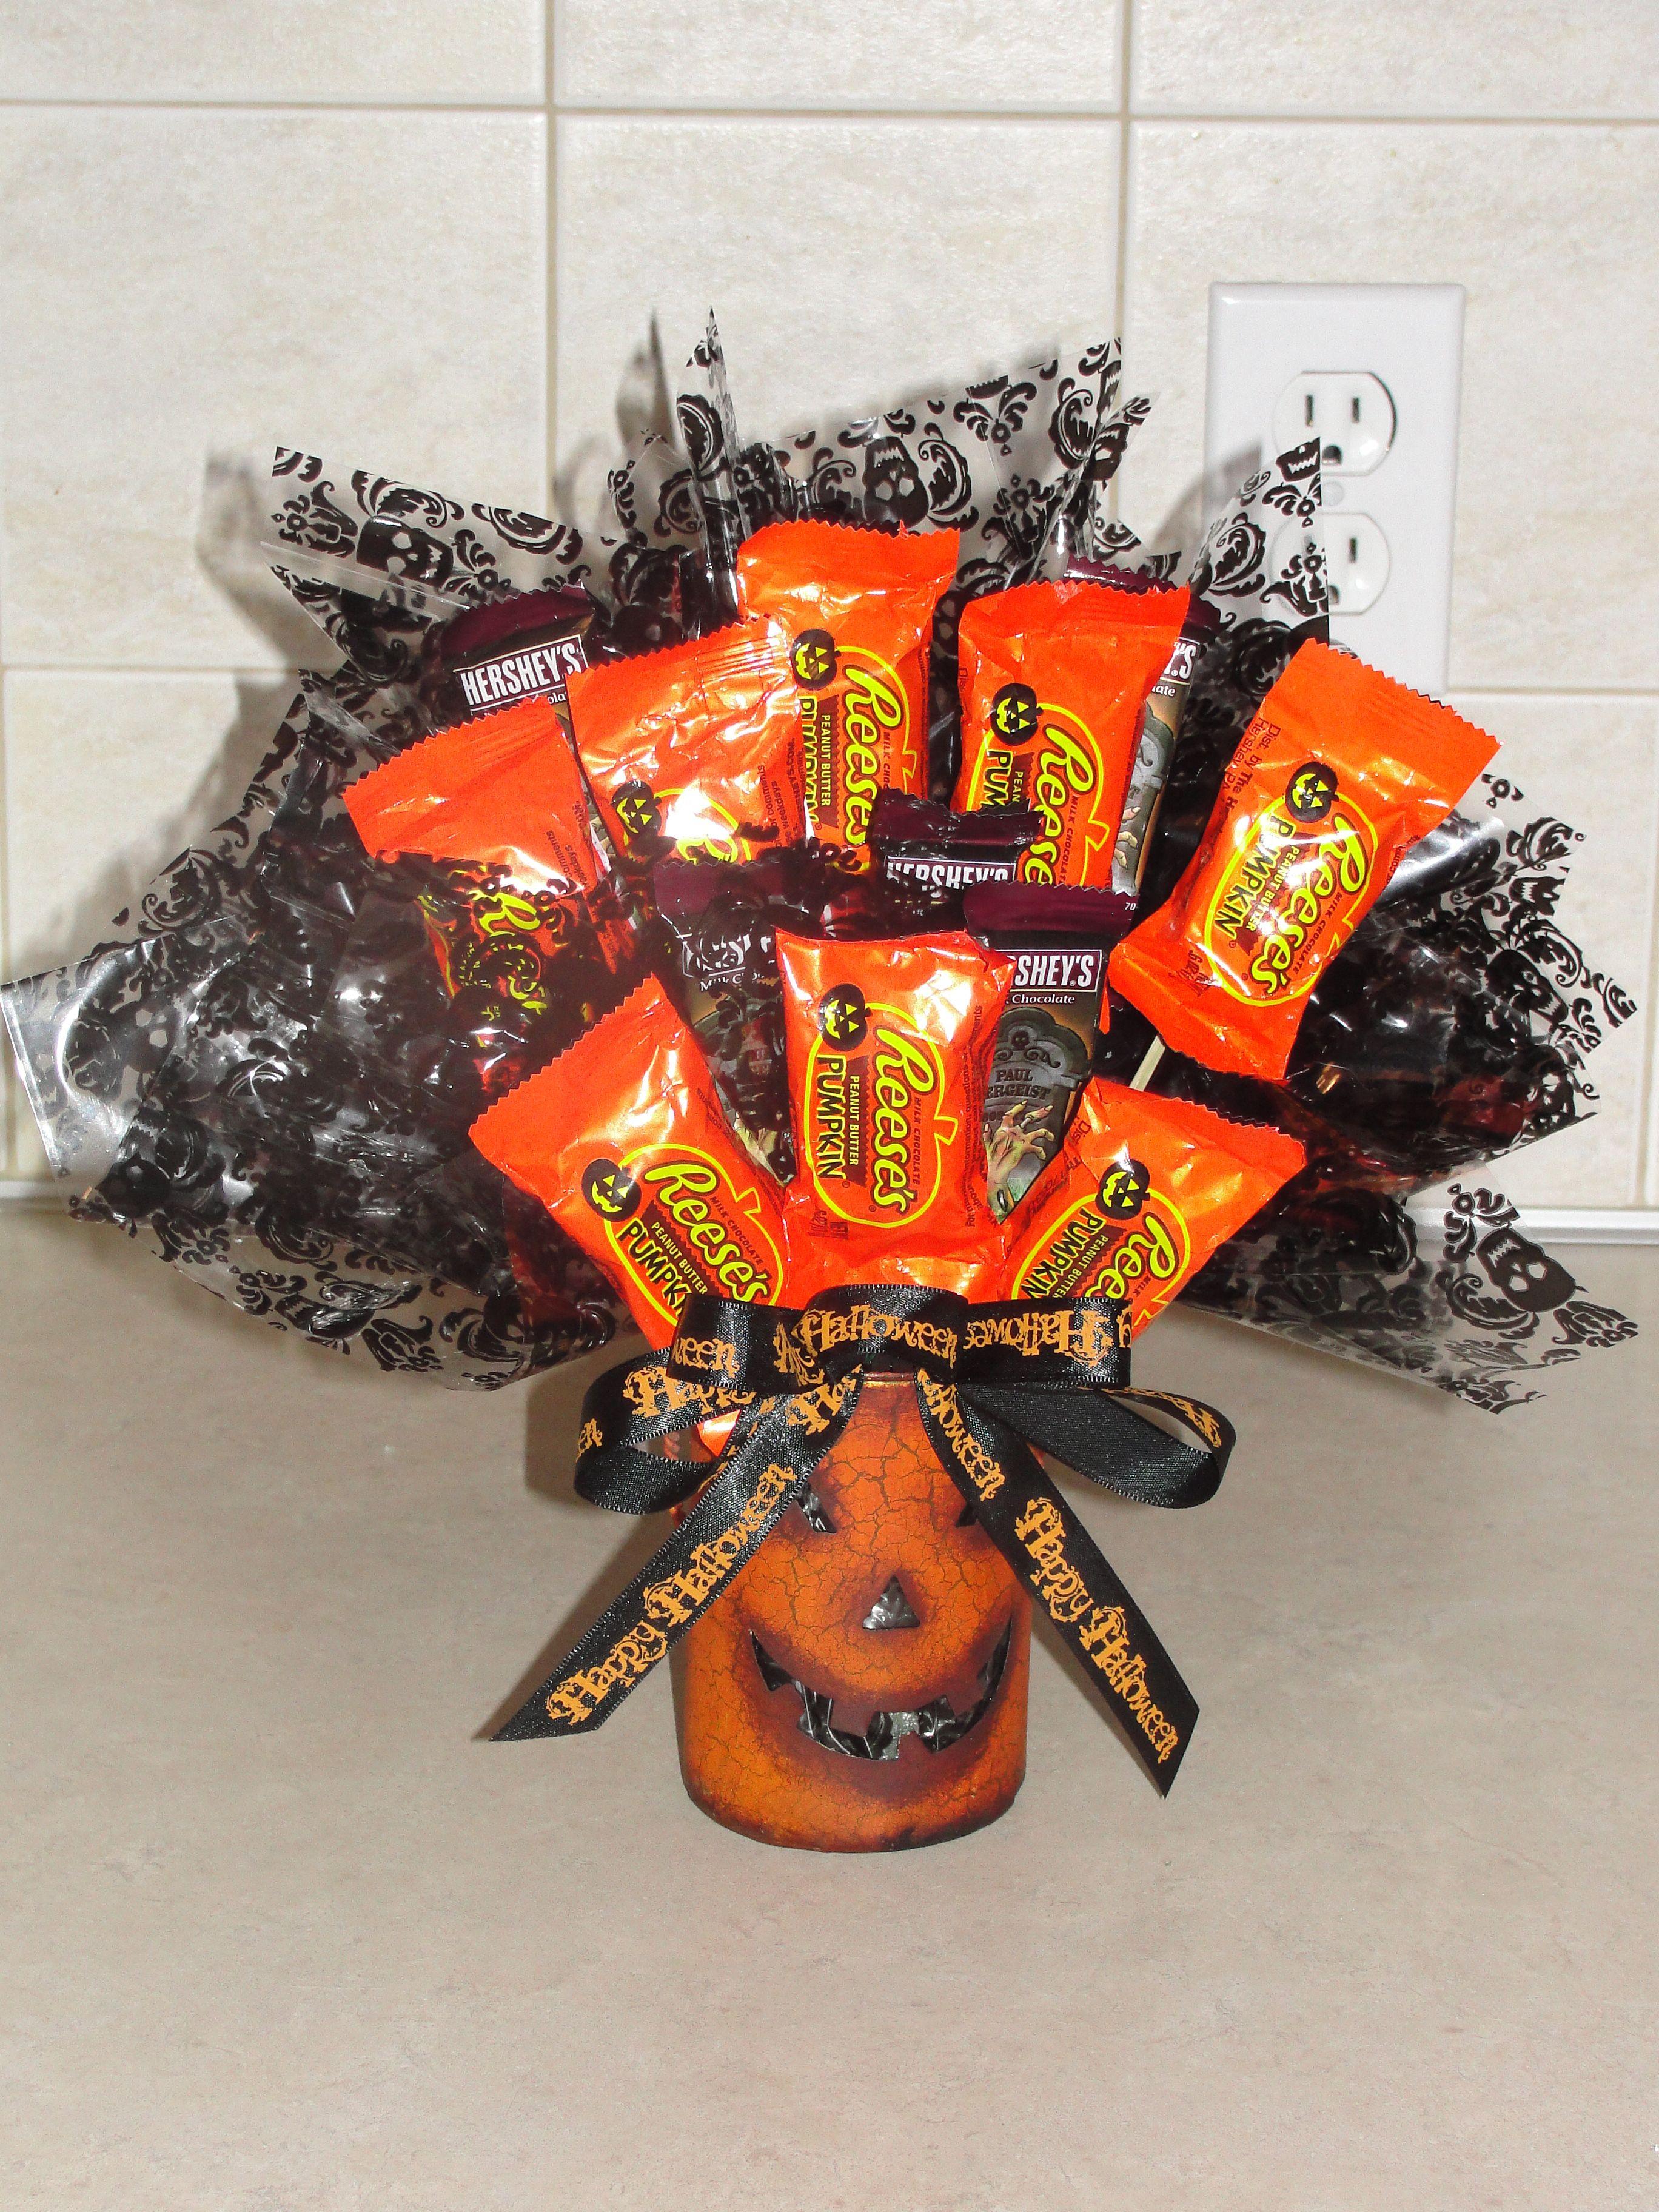 Halloween candy gift baskets